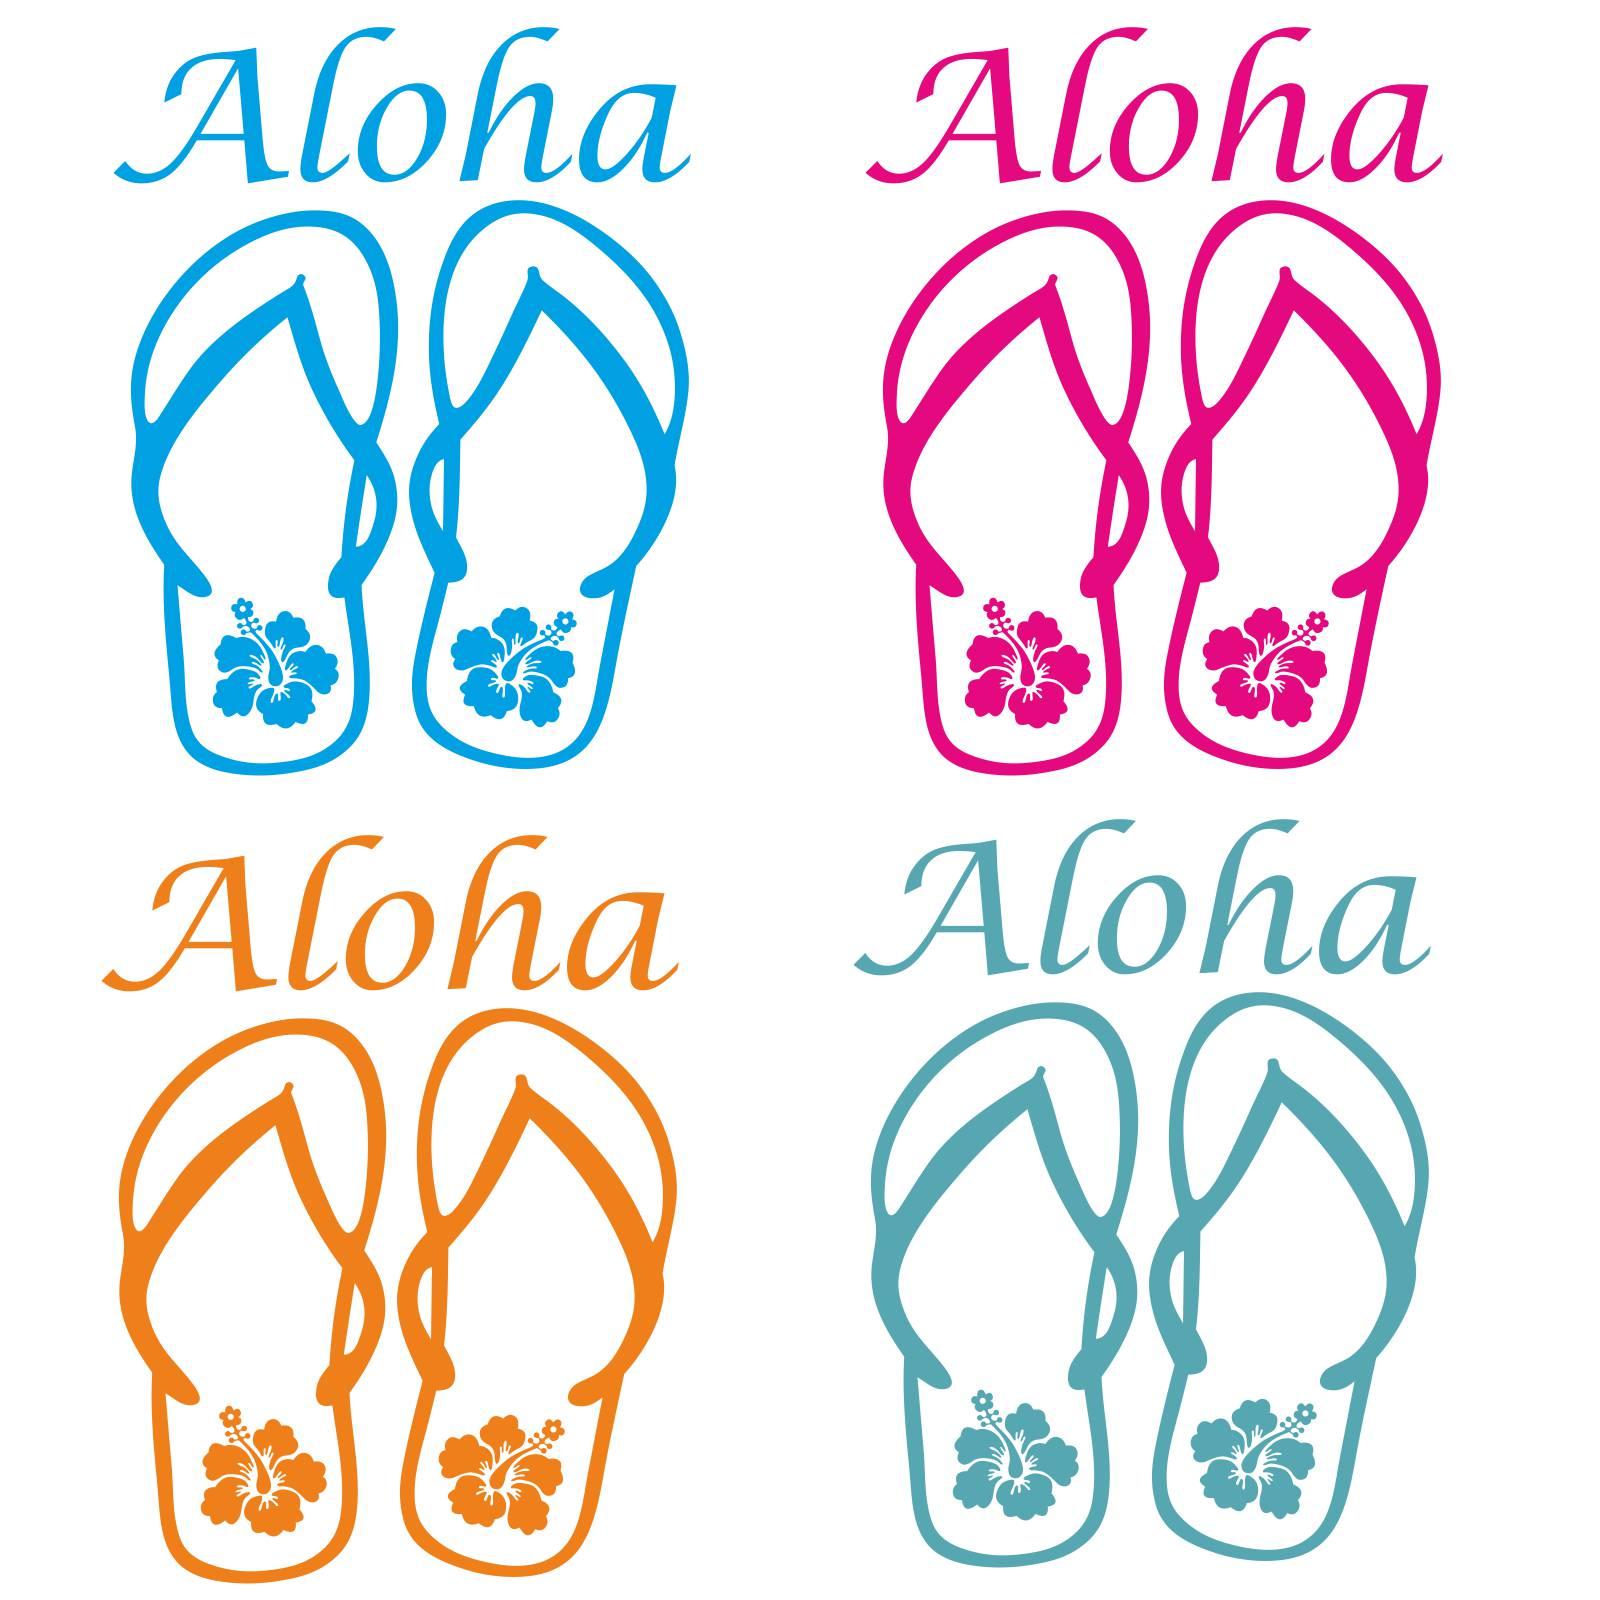 hibiskus hawaii sandalen aloha auto aufkleber autoaufkleber sticker blumen a319 ebay. Black Bedroom Furniture Sets. Home Design Ideas